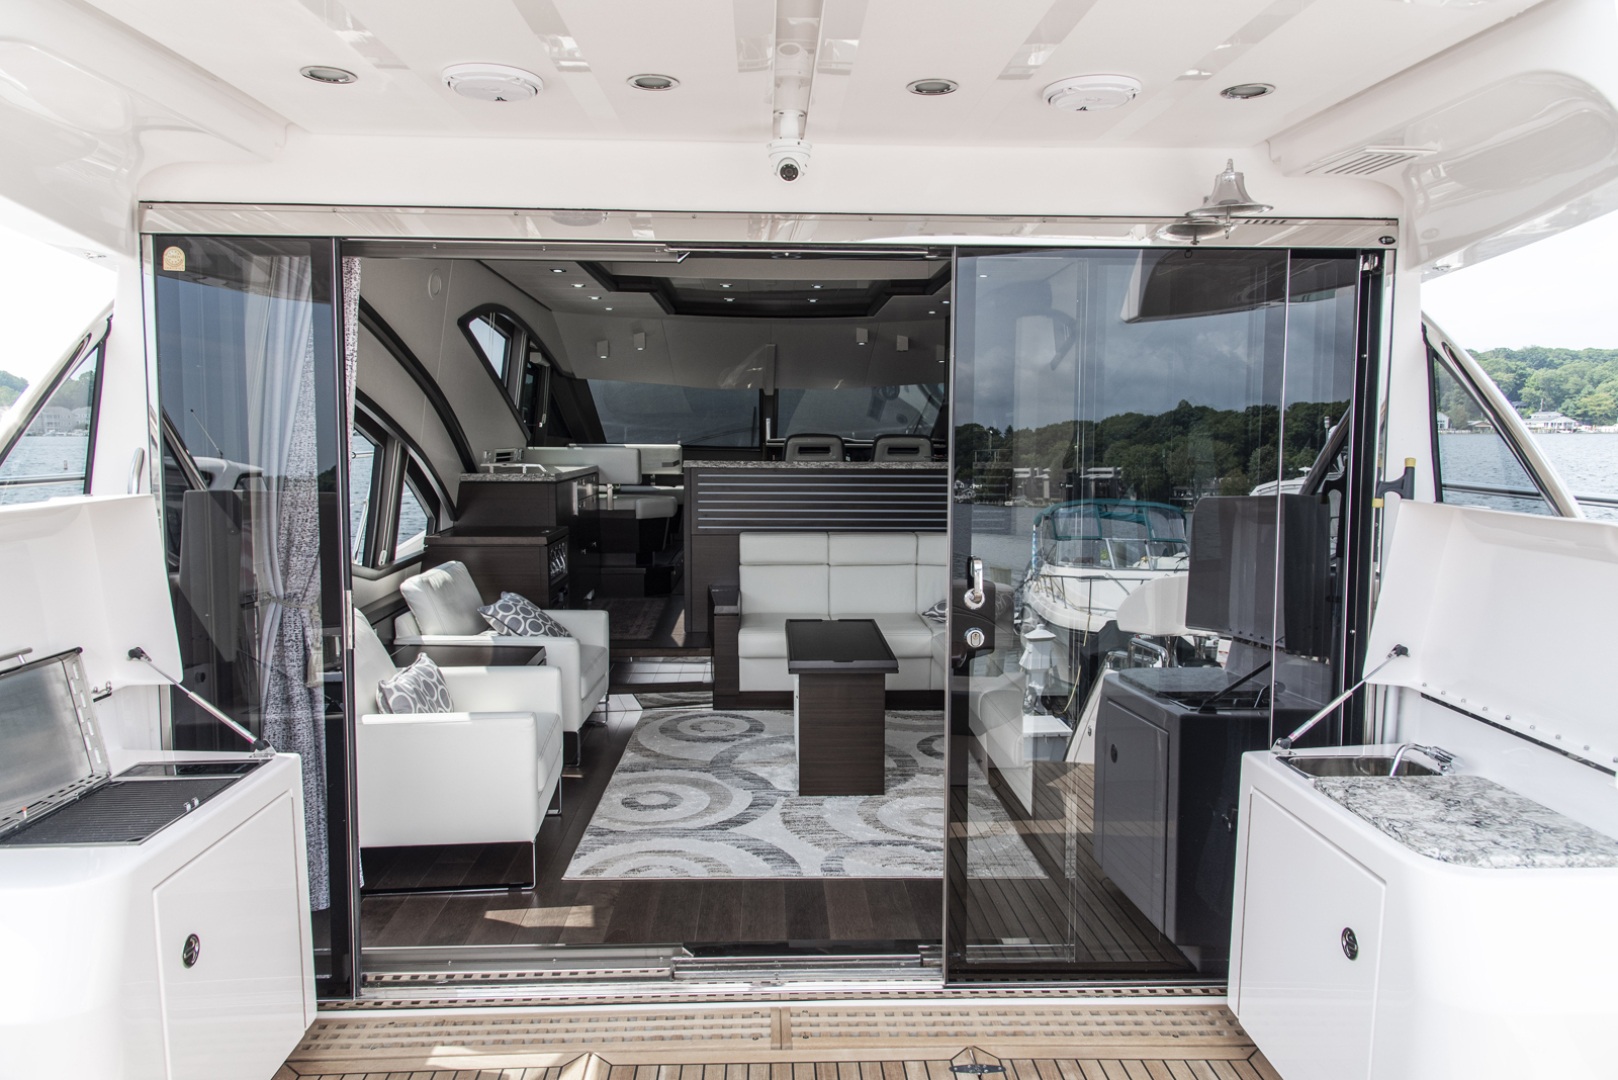 Neptunus-Motor Yacht Express 2018-LIQUID WISDOM Grand Haven-Michigan-United States-Salon looking forward-1484953 | Thumbnail